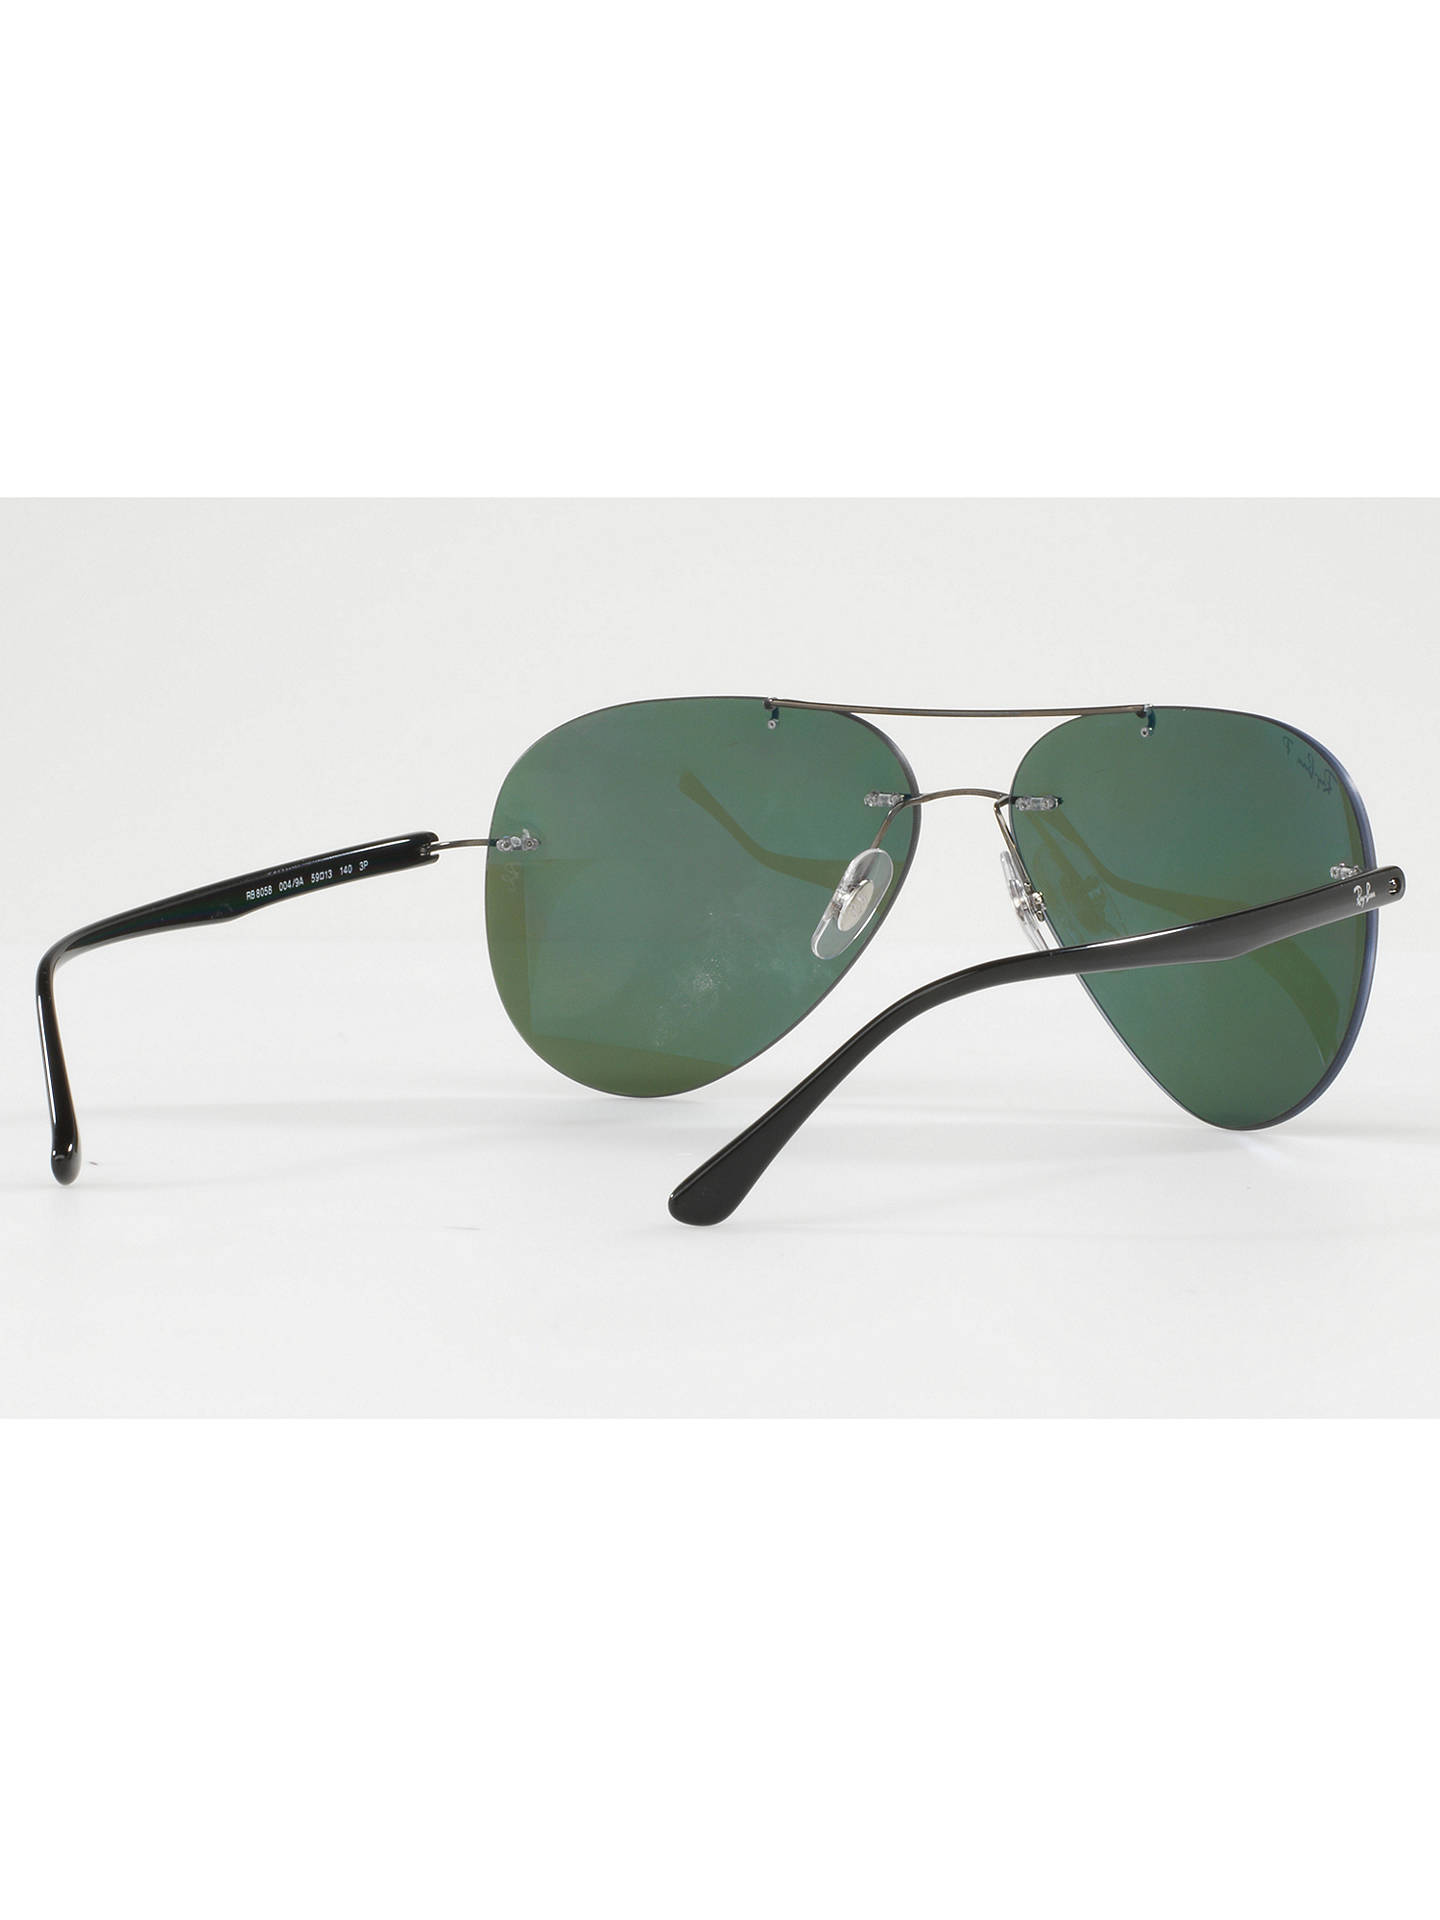 9b9d0b5f1a ... BuyRay-Ban RB8058 Polarised Frameless Aviator Sunglasses